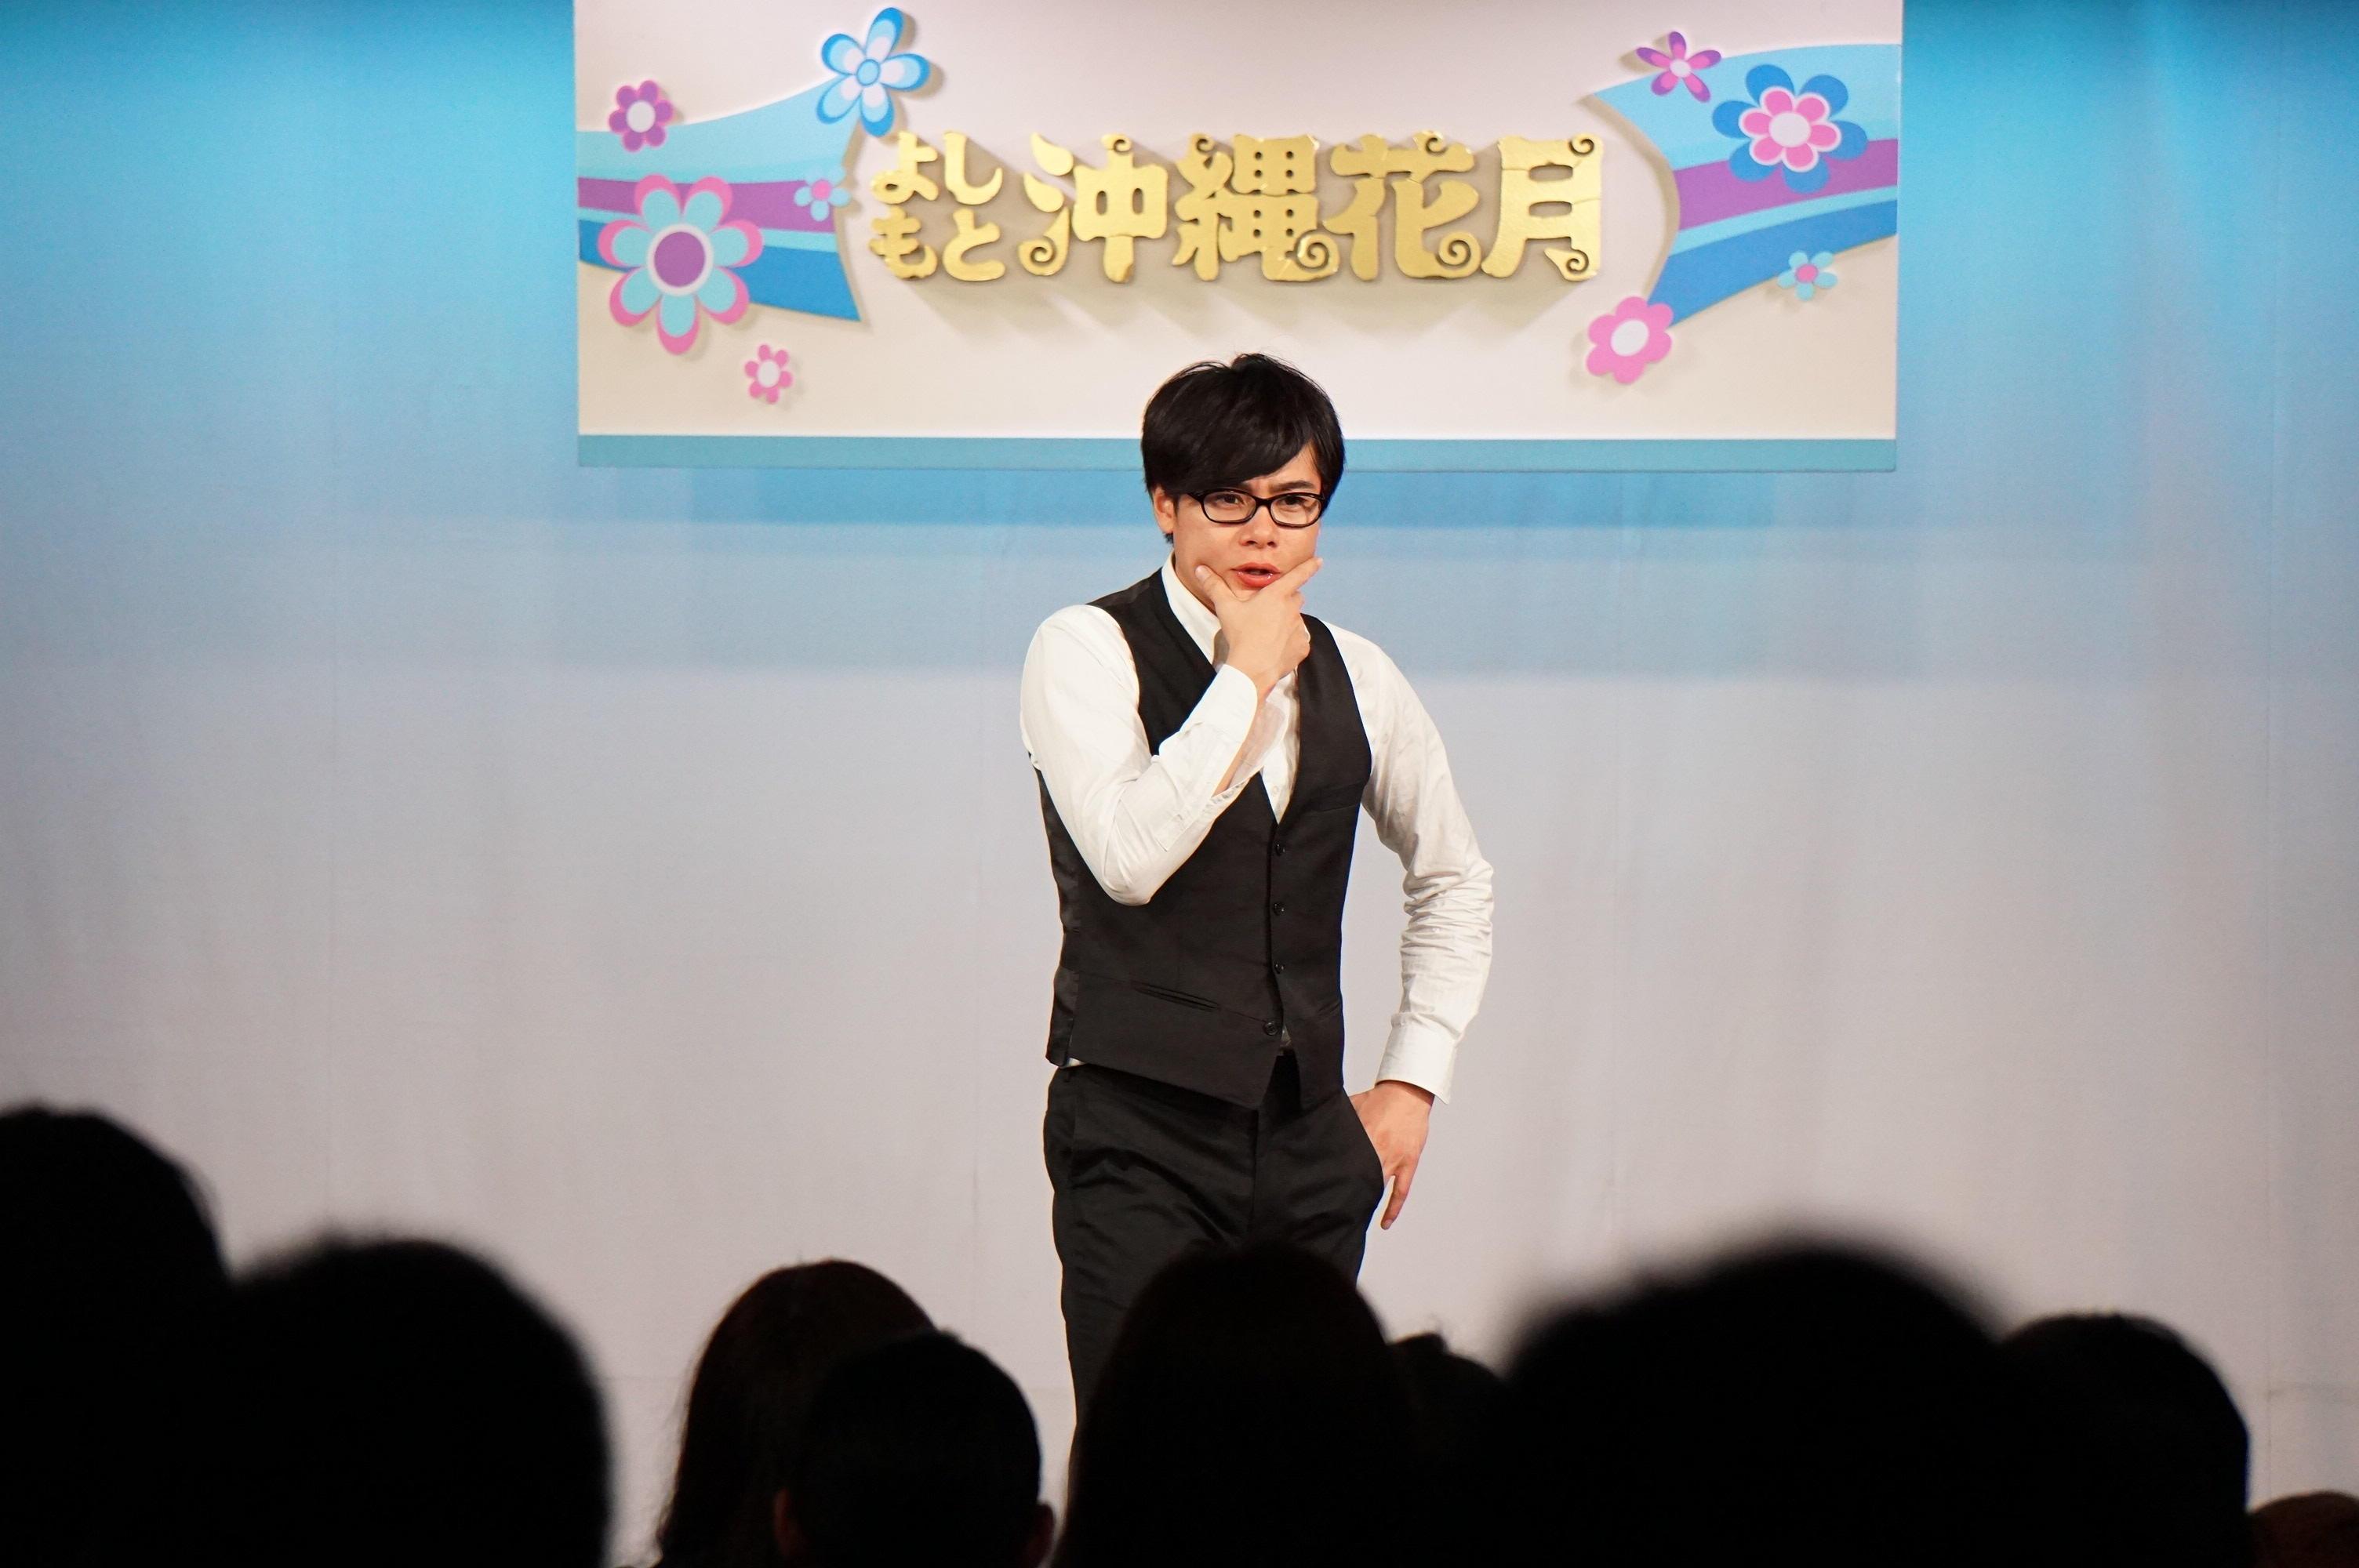 http://news.yoshimoto.co.jp/20151231202215-a5401cc4c385791ea8391b7d7abd457c5b38a838.jpg